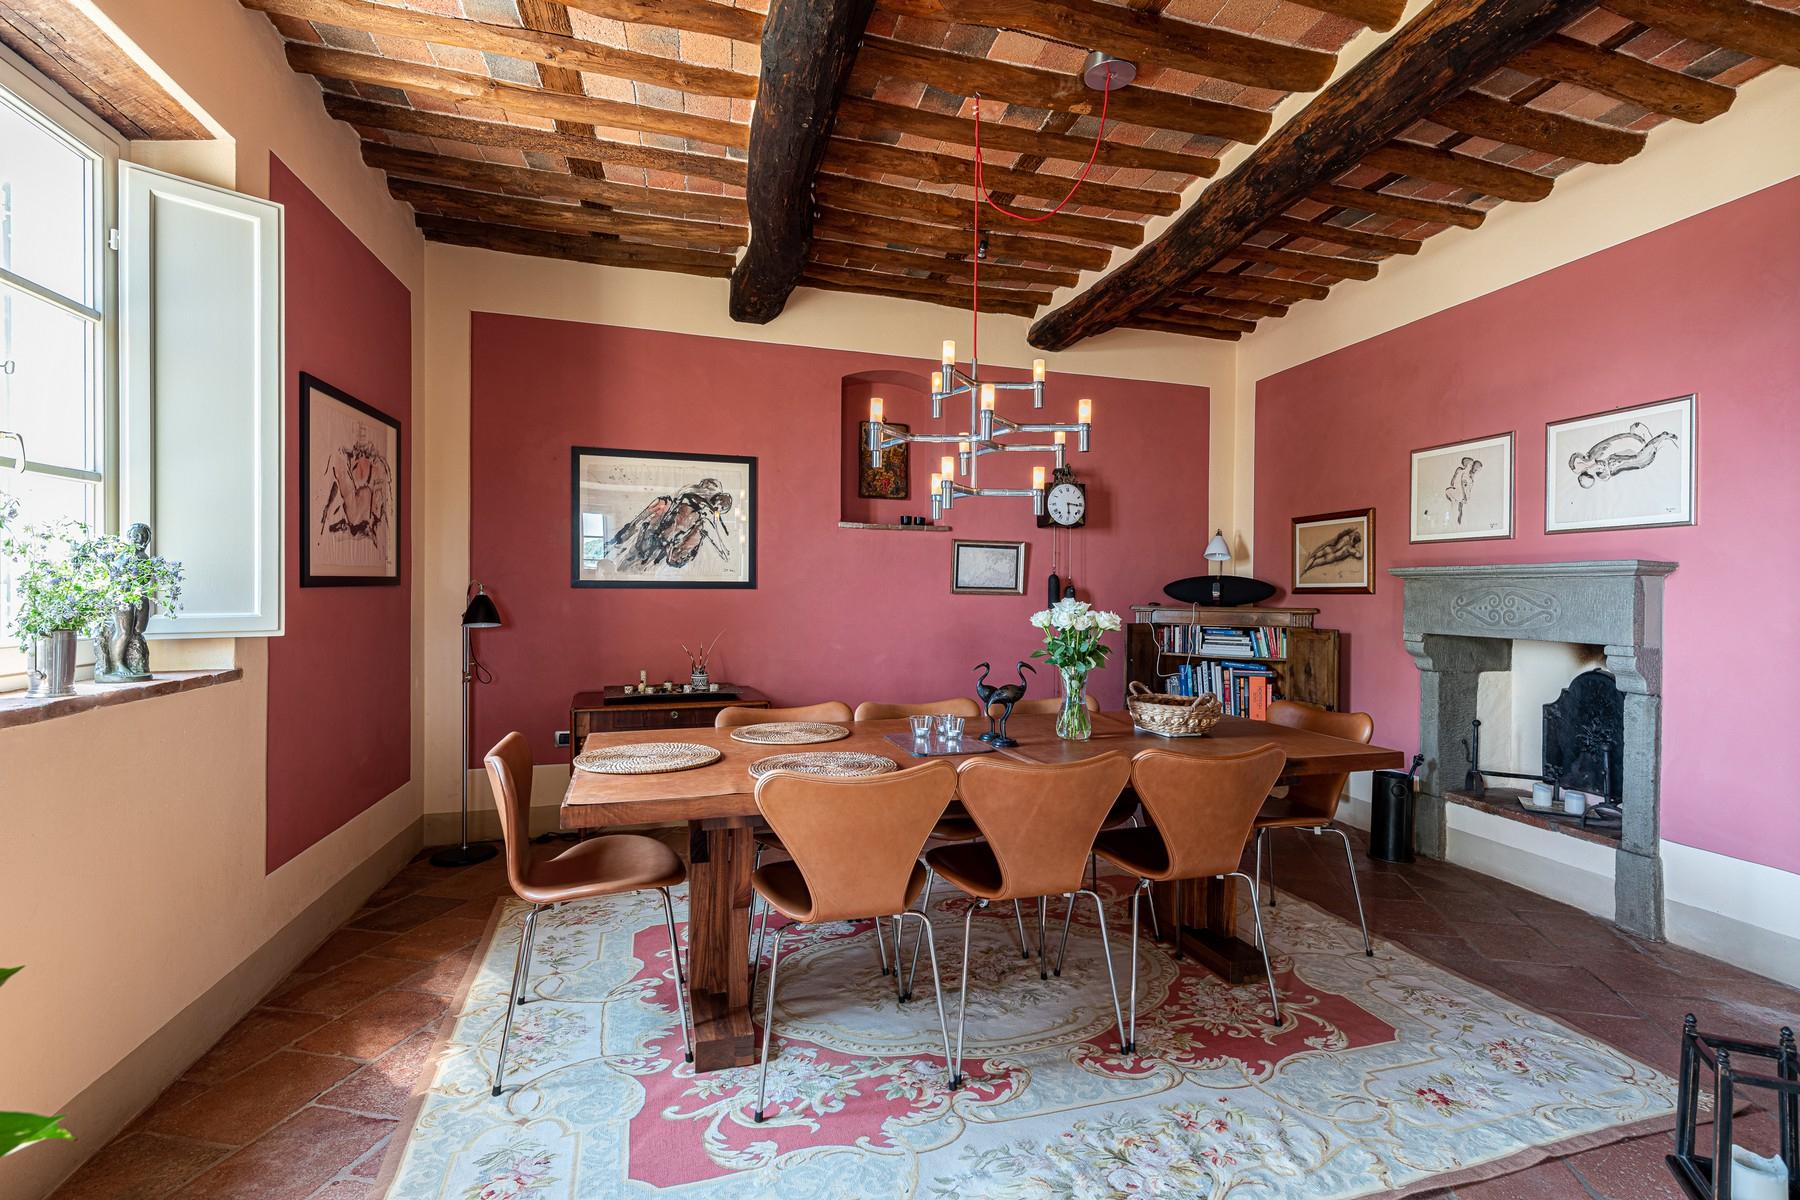 Rustico in Vendita a Lucca: 5 locali, 500 mq - Foto 4